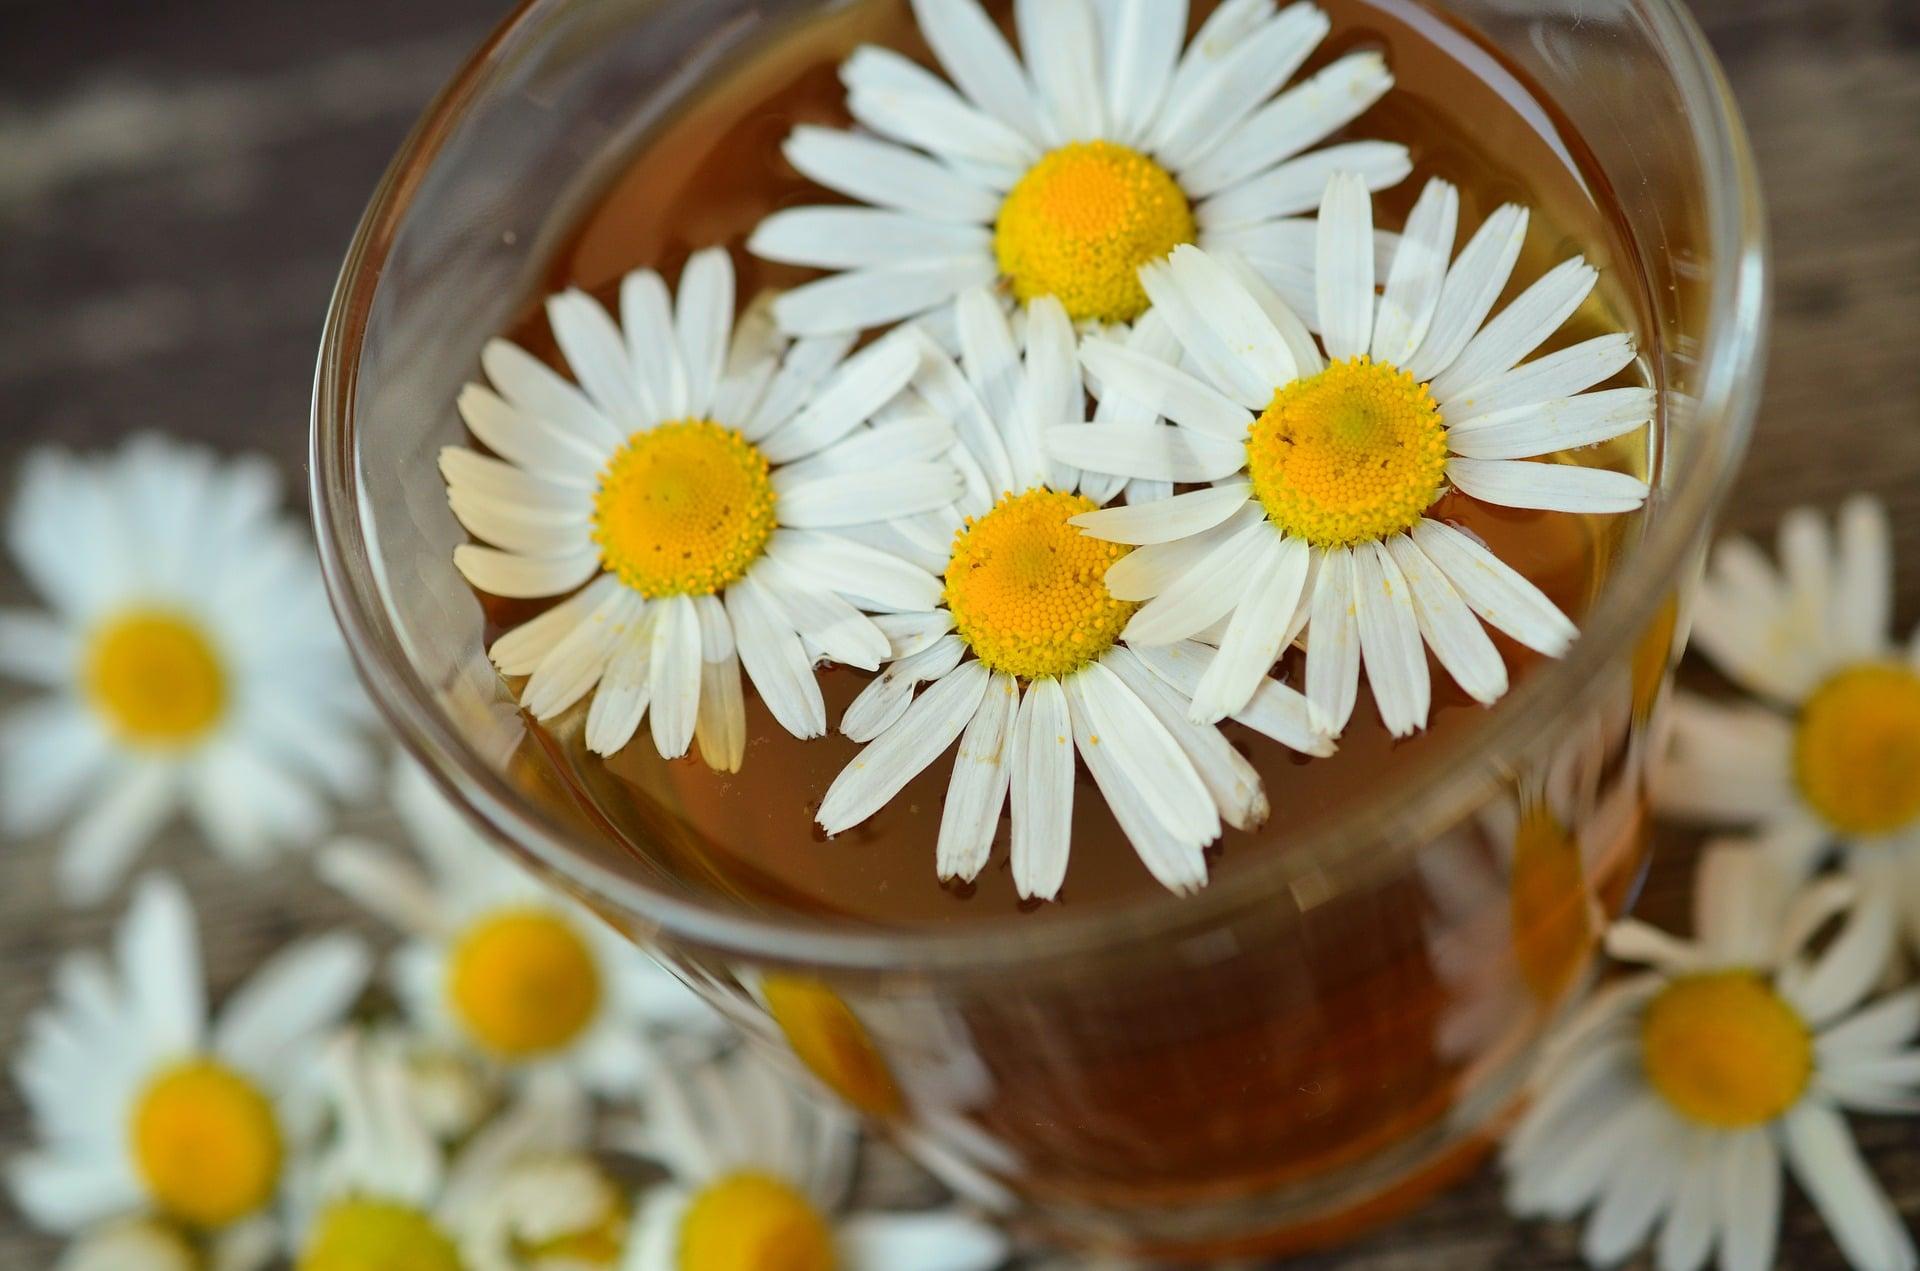 Foods That Help You Sleep - Chamomile Tea